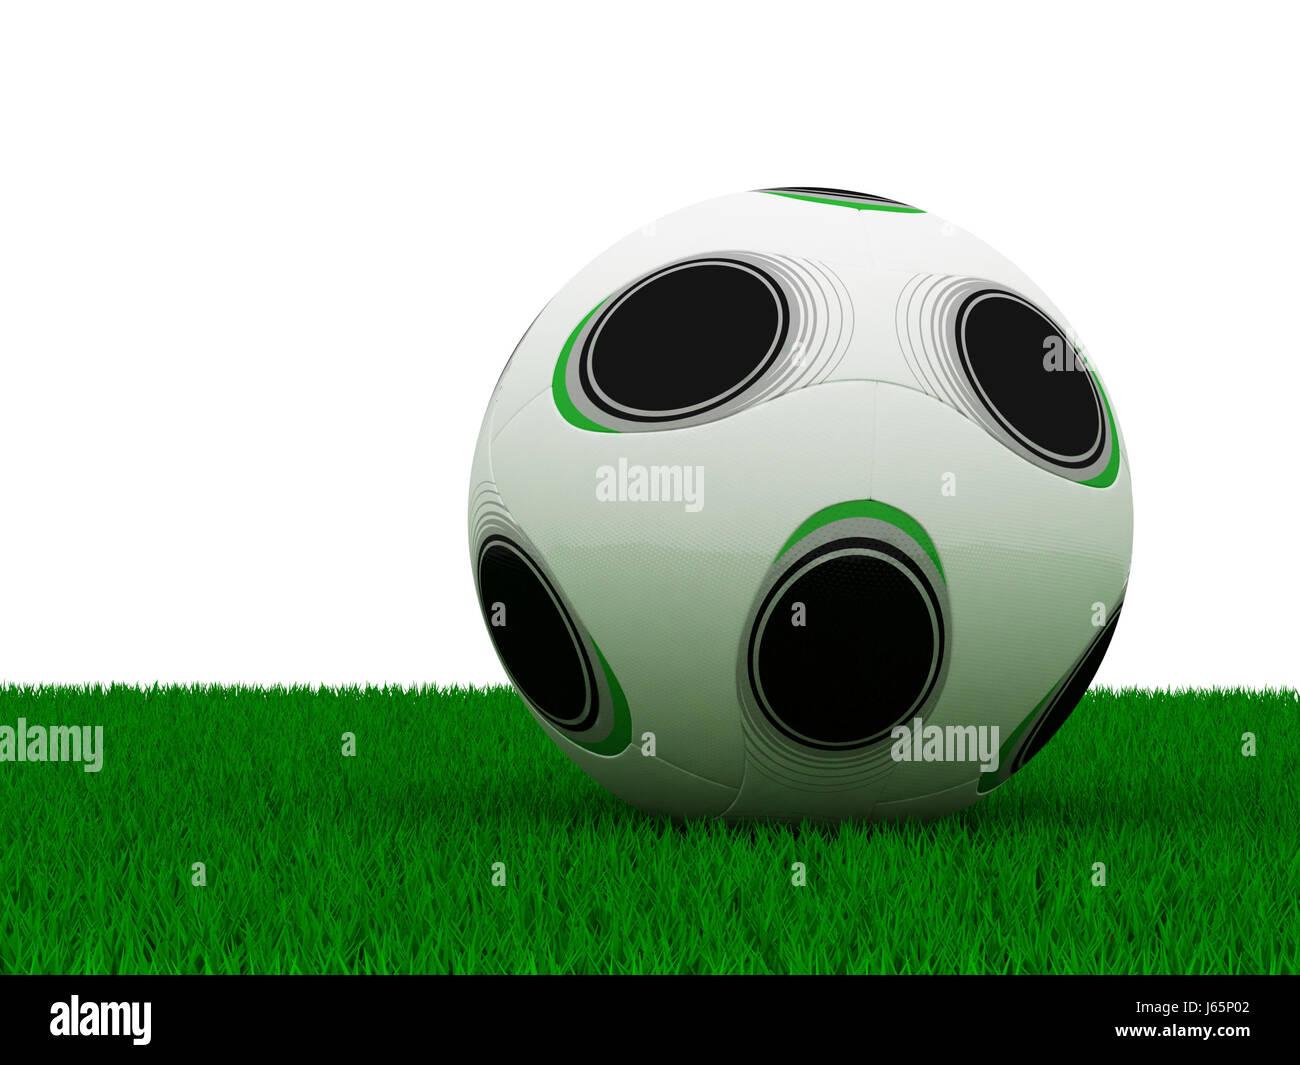 football on grass - Stock Image